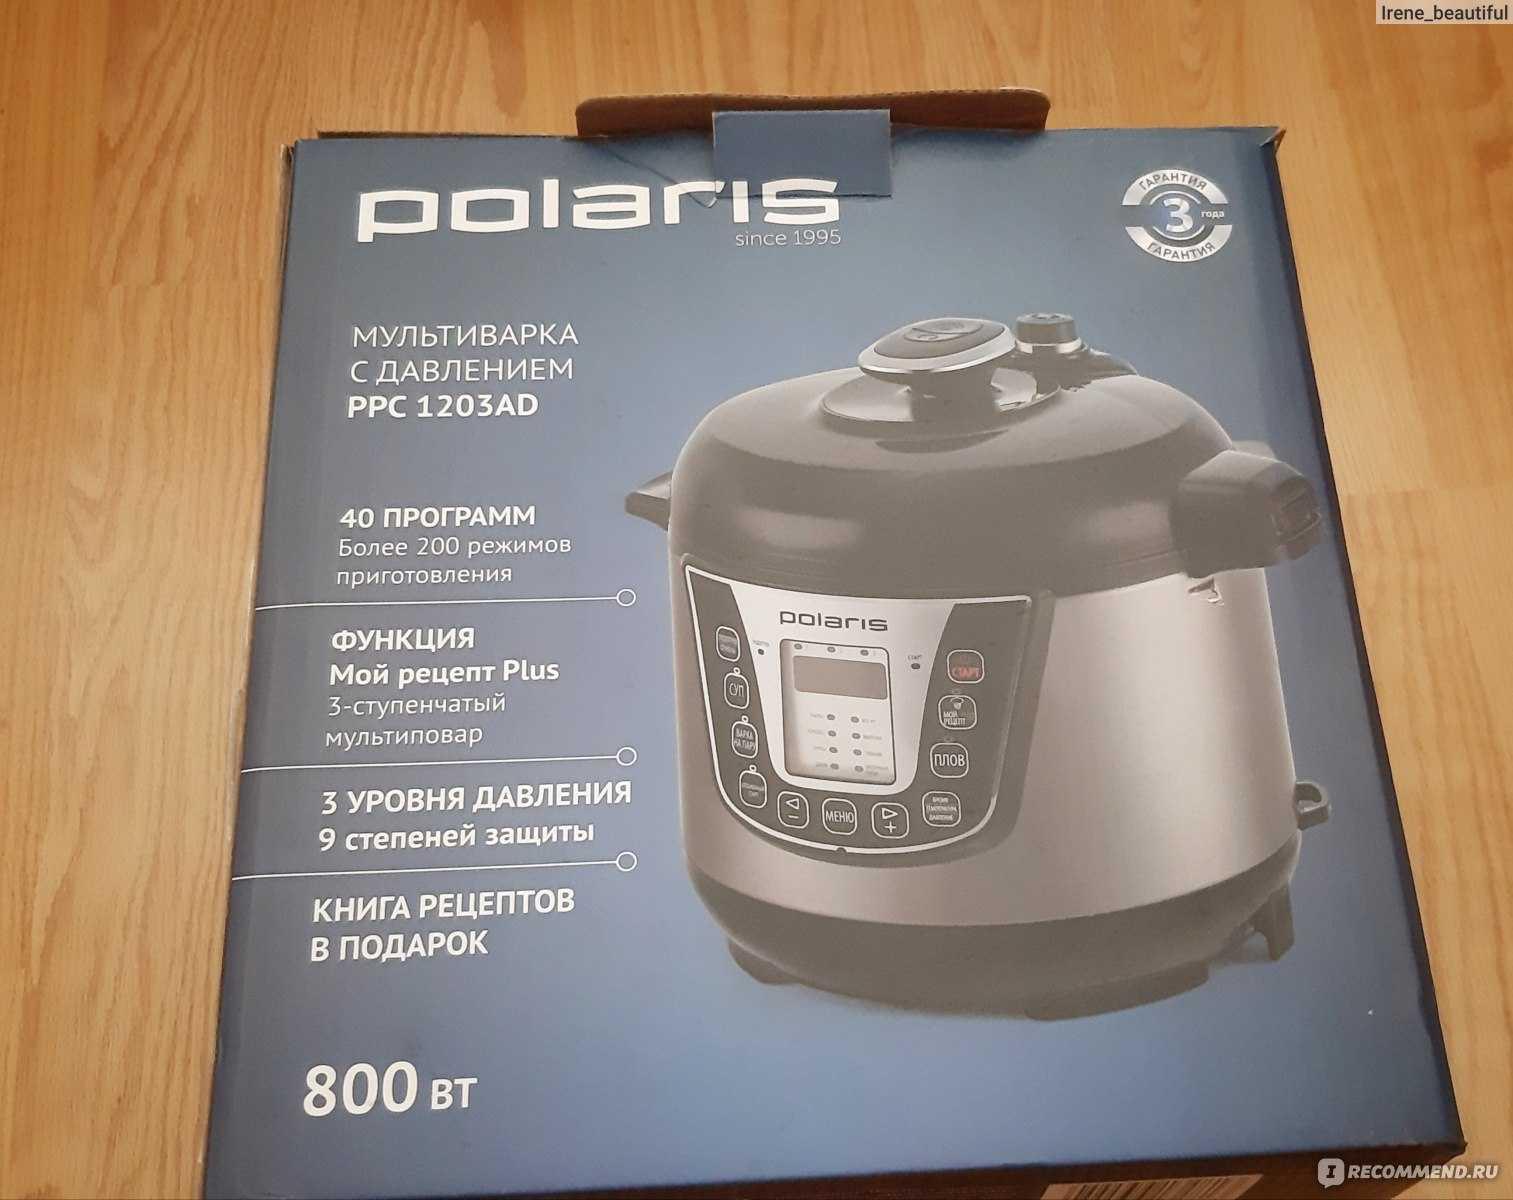 Скороварка/мультиварка polaris ppc 1305ad: отзывы и обзор